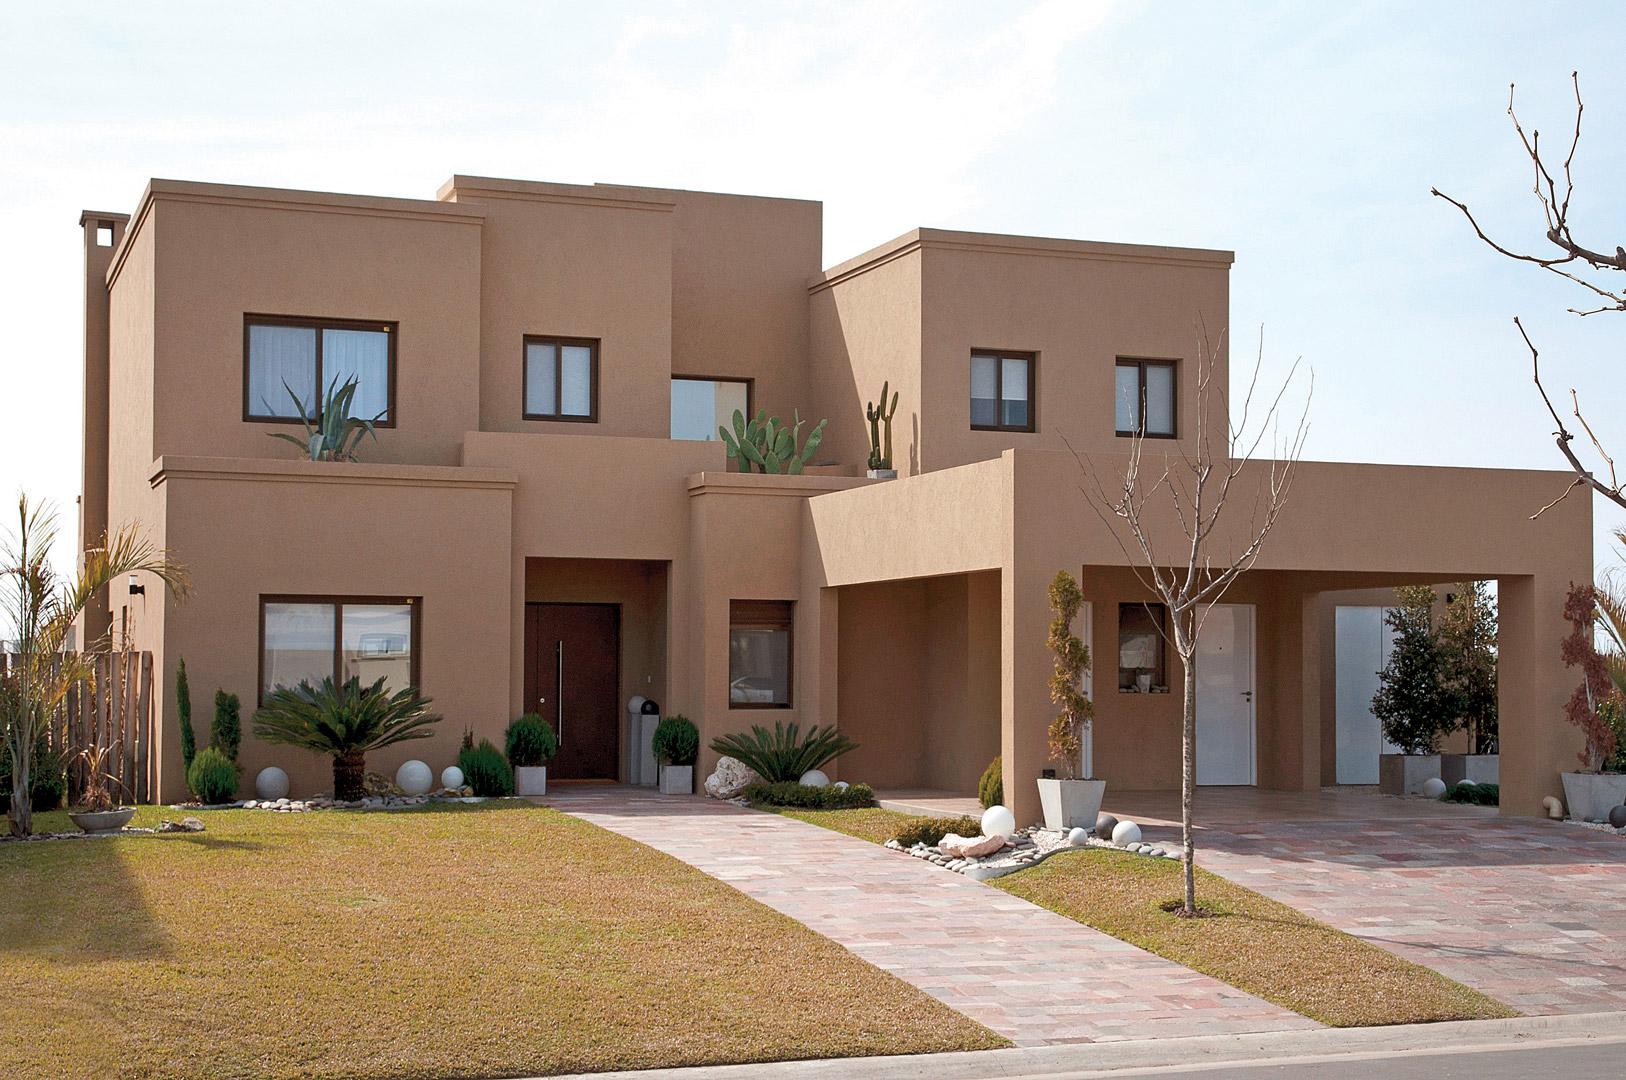 fredi llosa y arquinova casas casa actual estilo ForCasa Actual